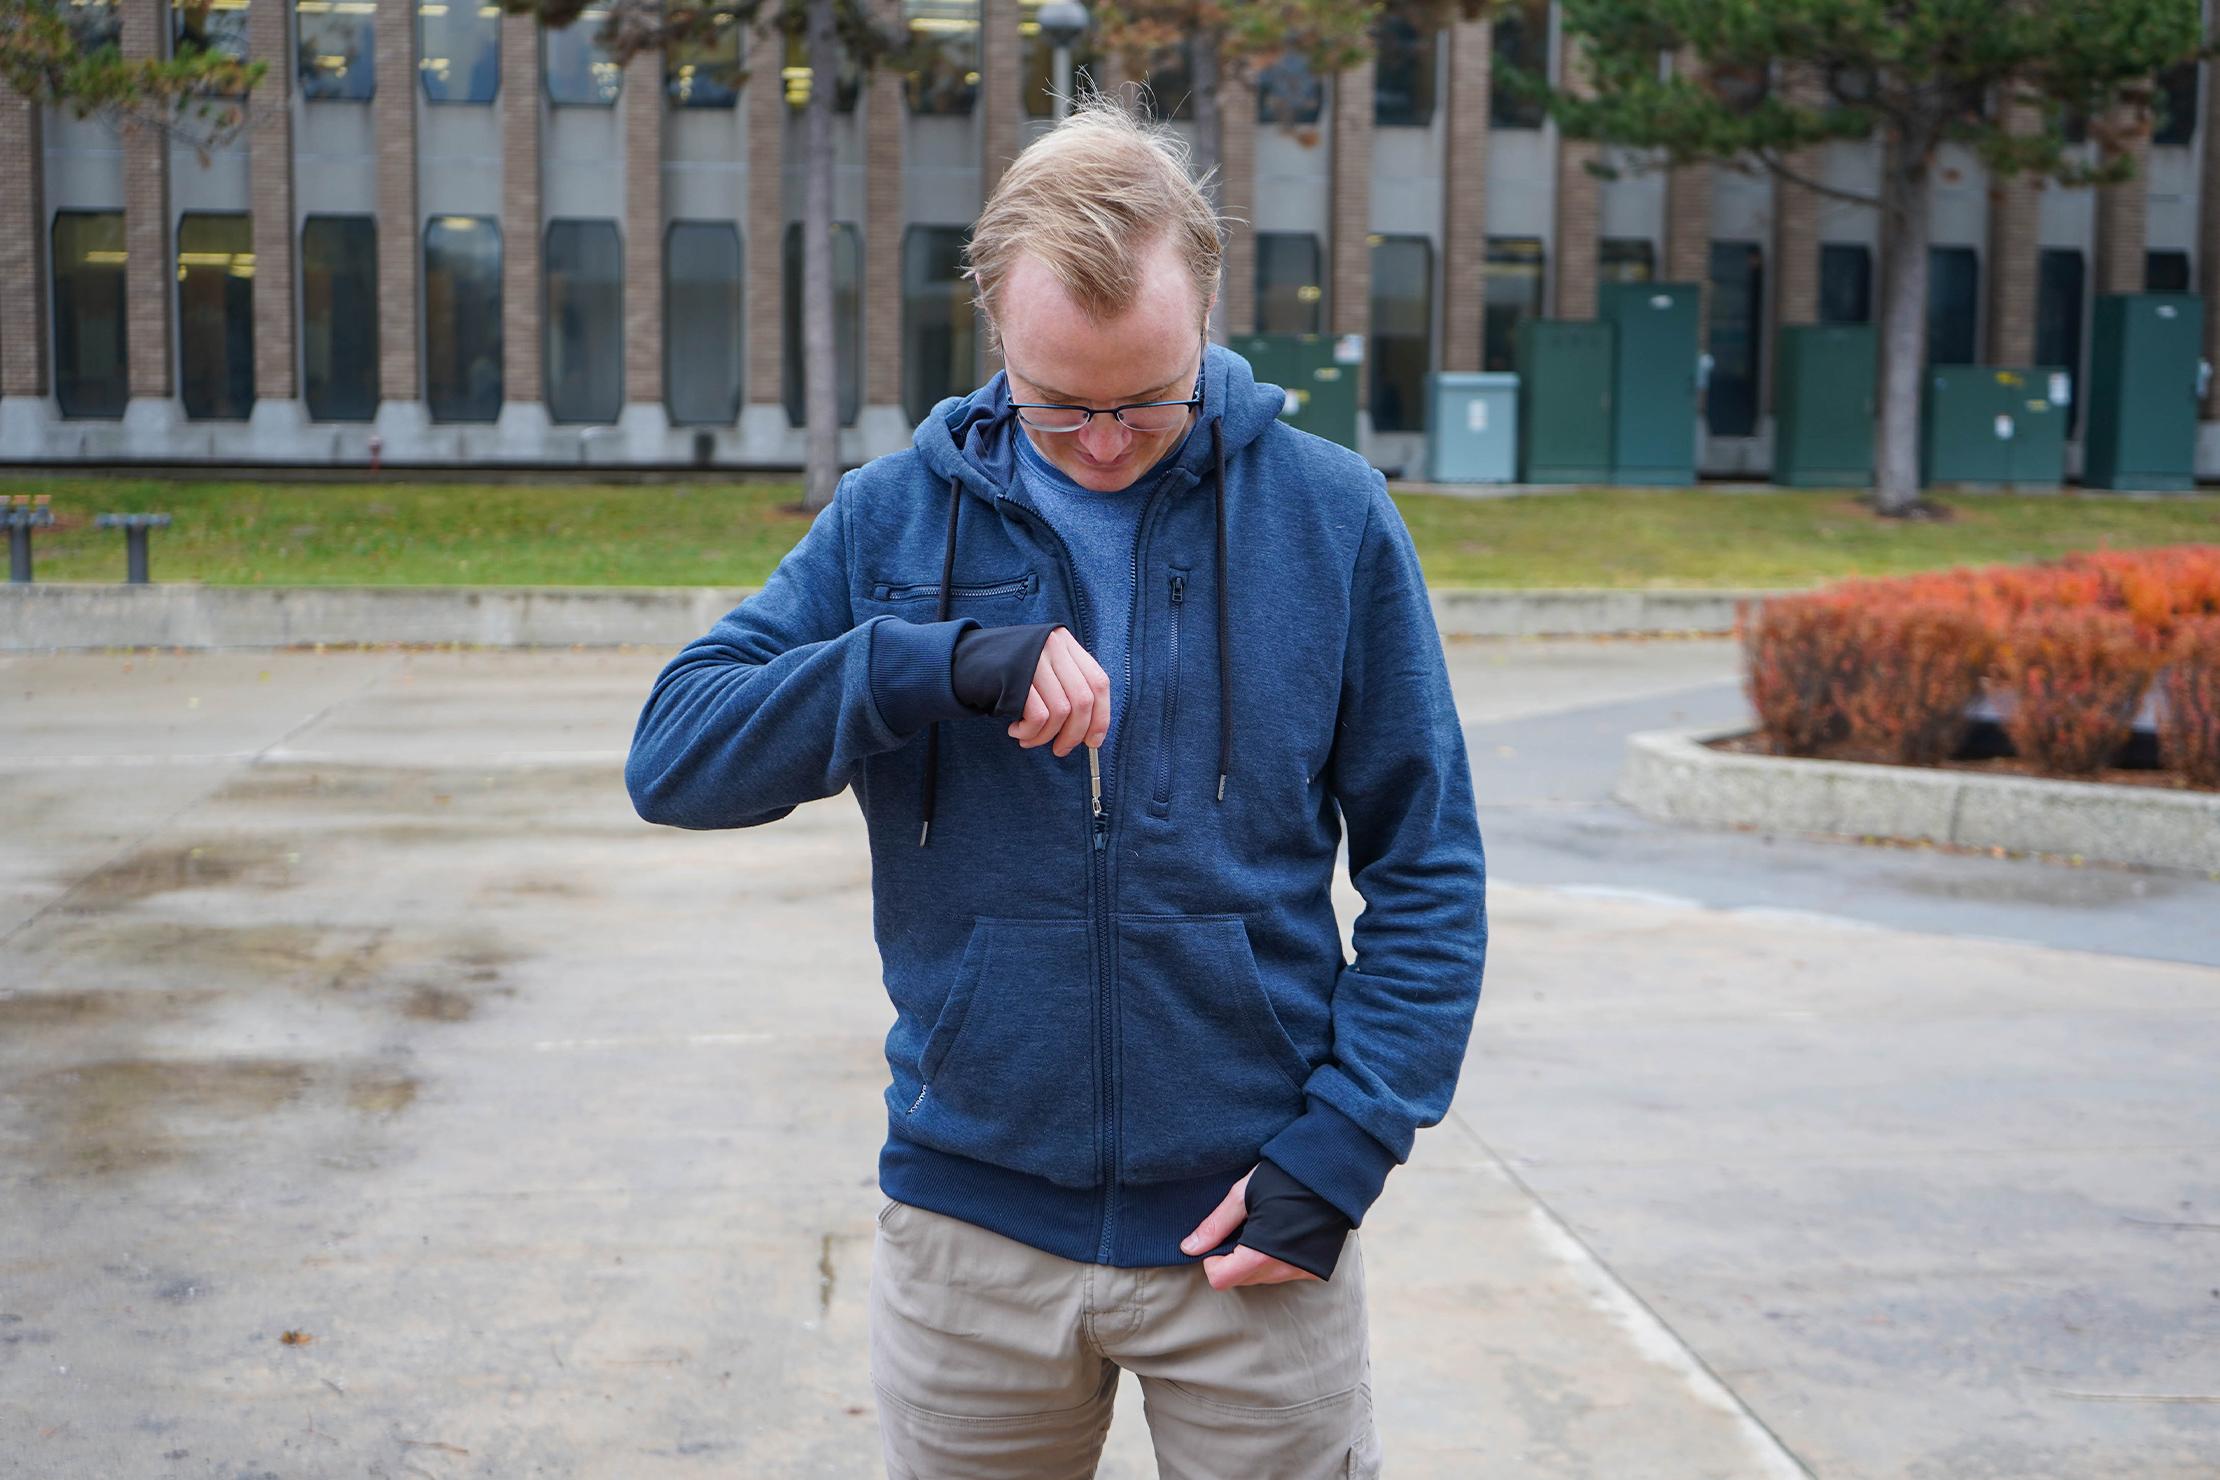 BauBax Sweatshirt 2.0 In Detroit